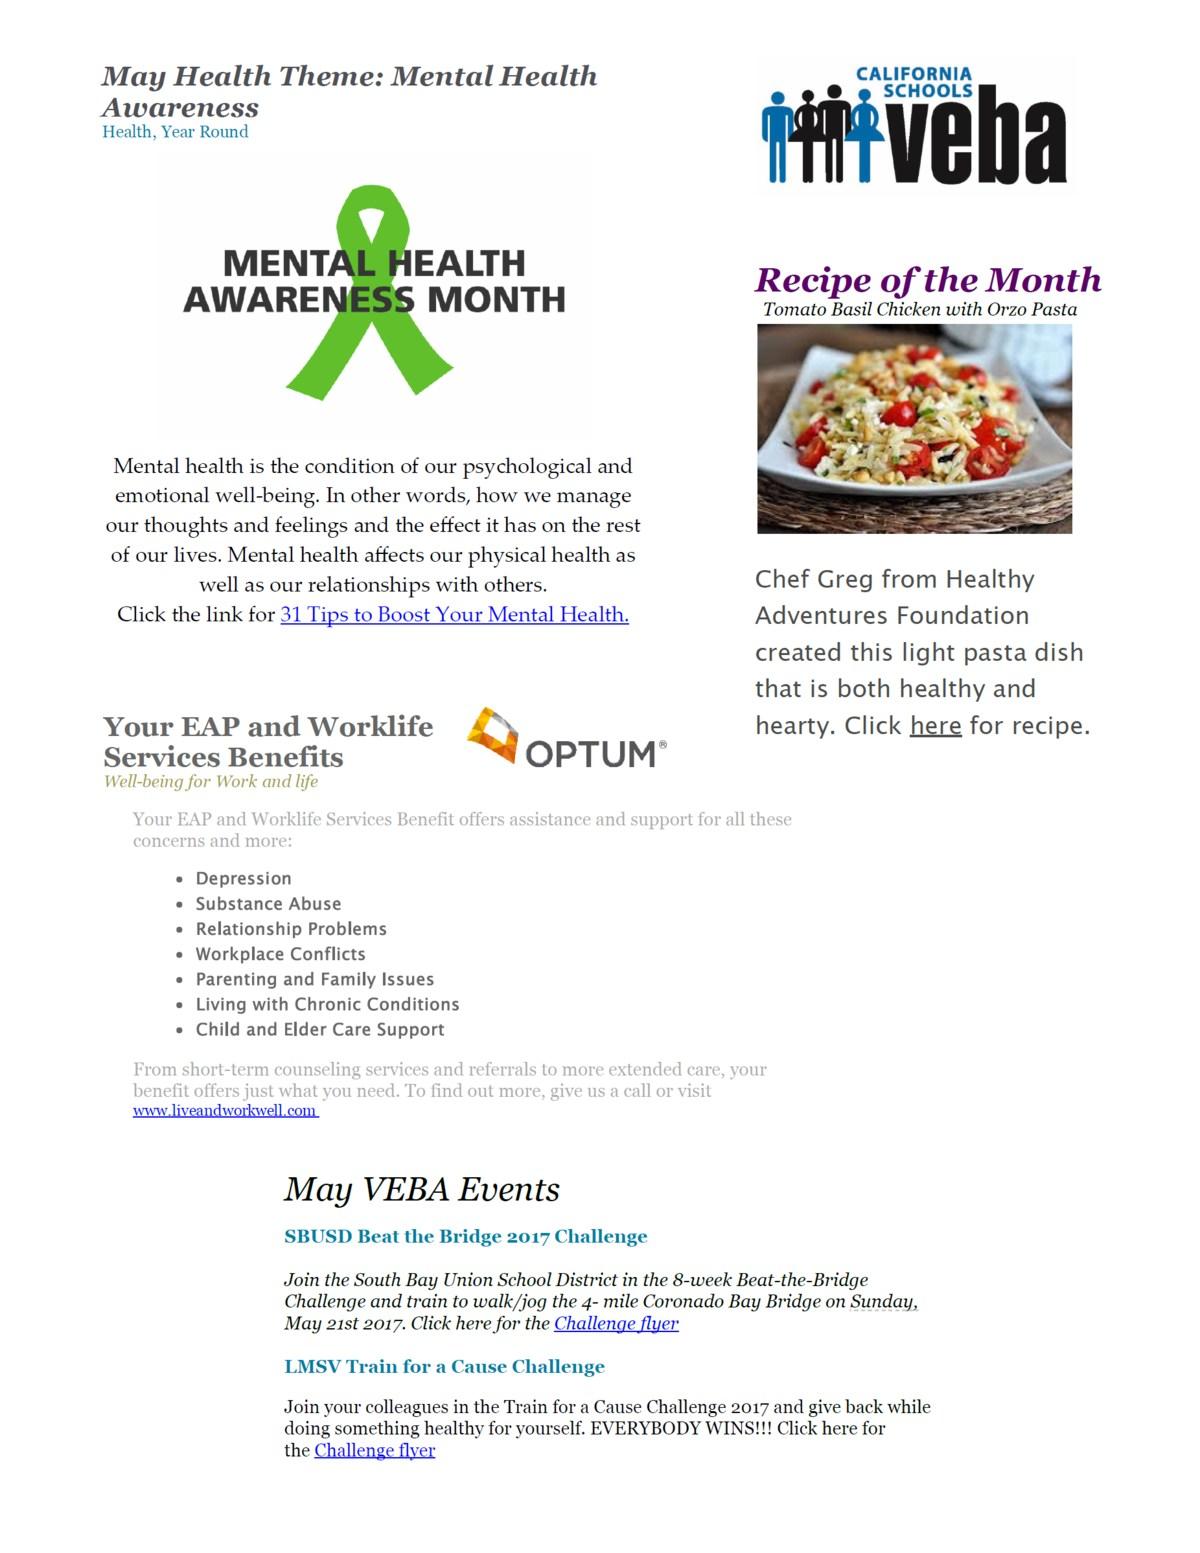 May VEBA PDF Flyer Graphic